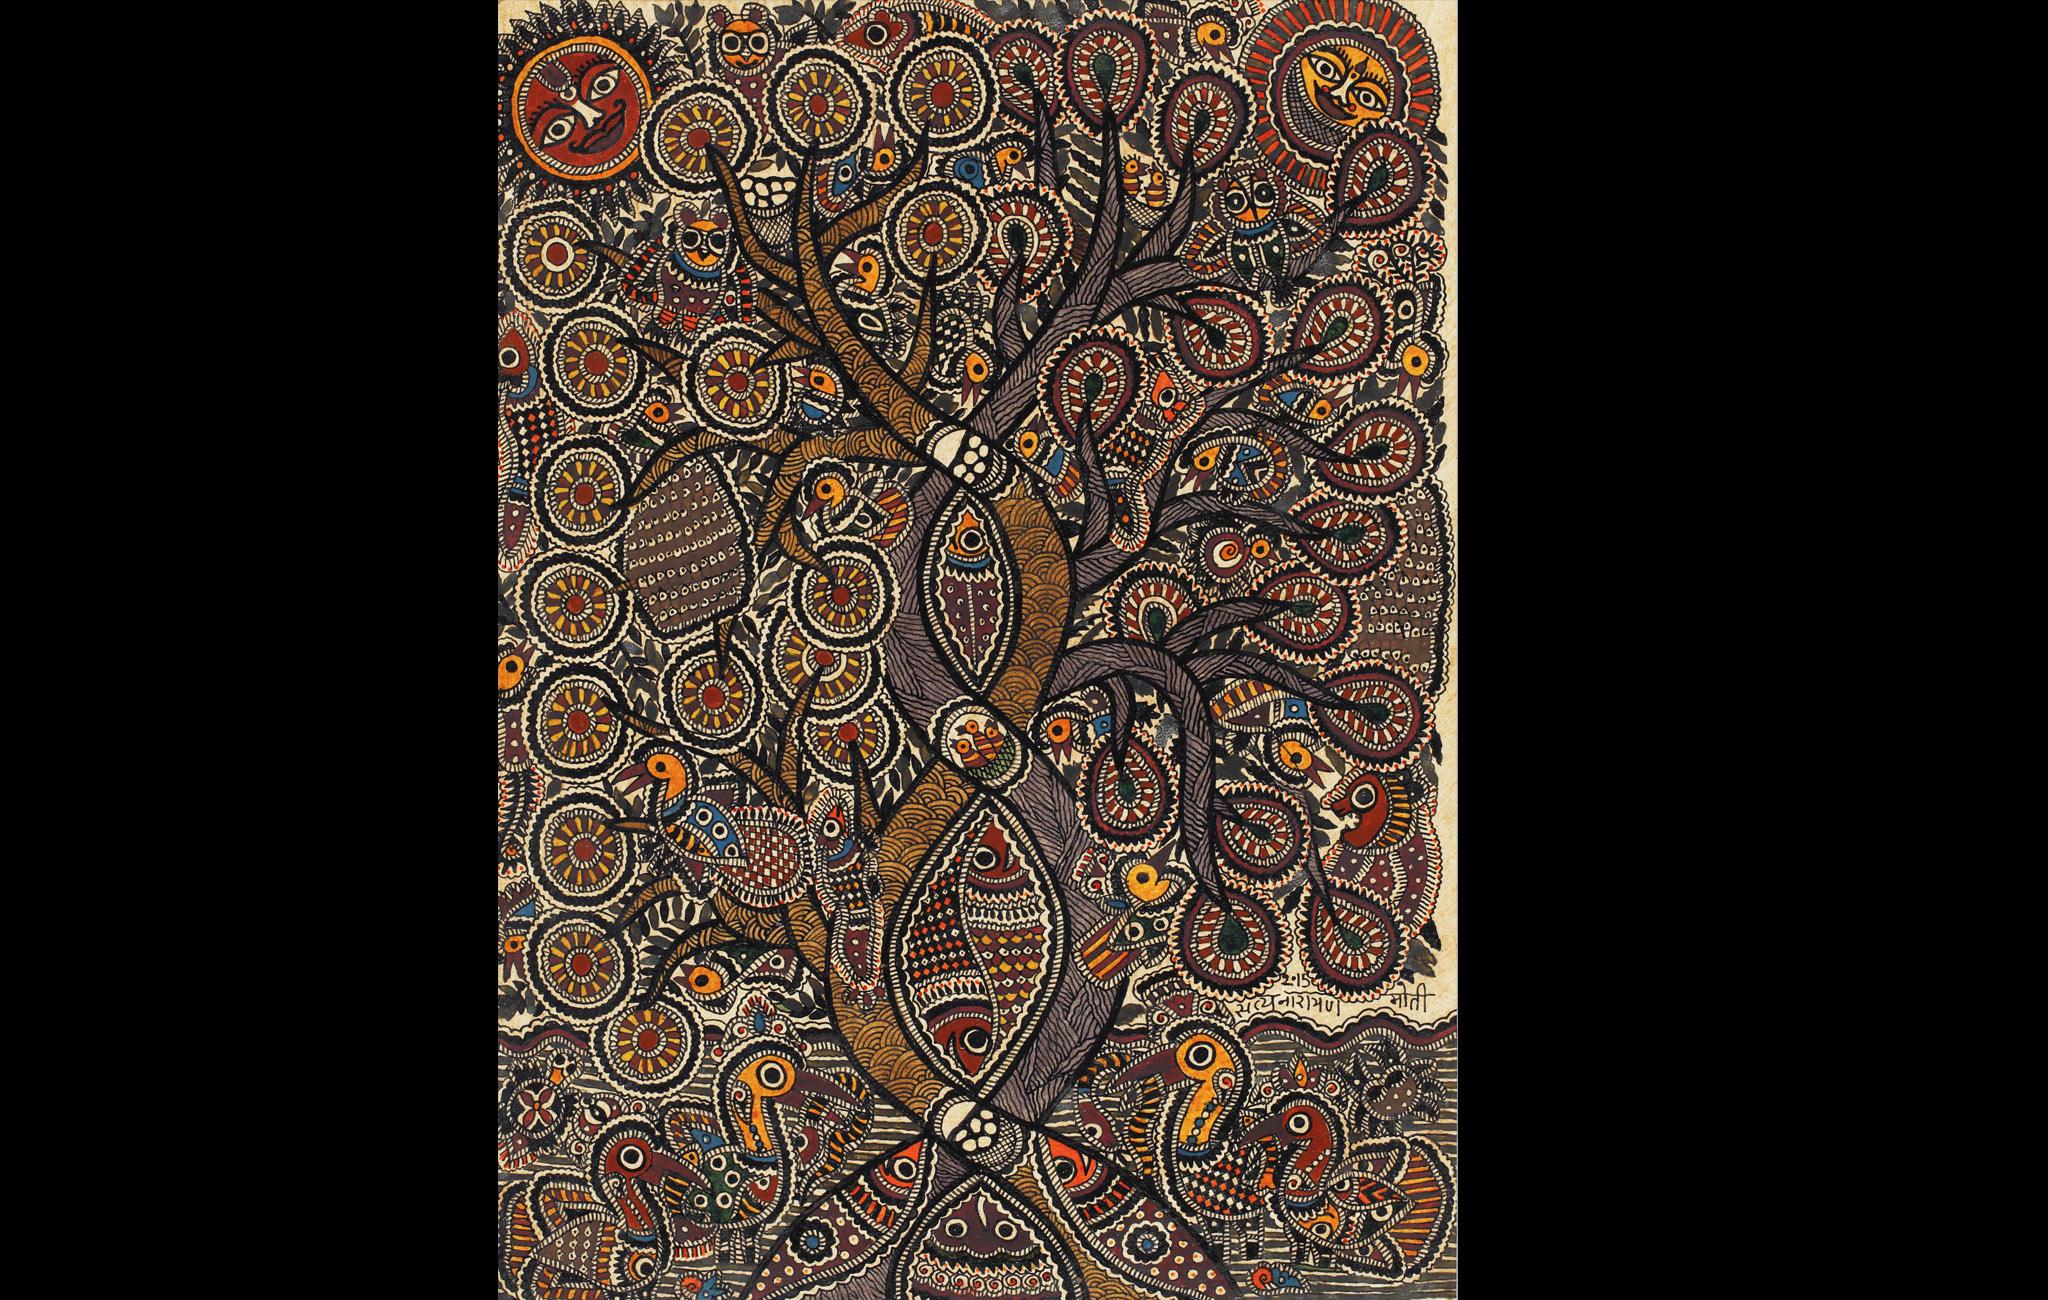 Tree of Life - Mithila painting